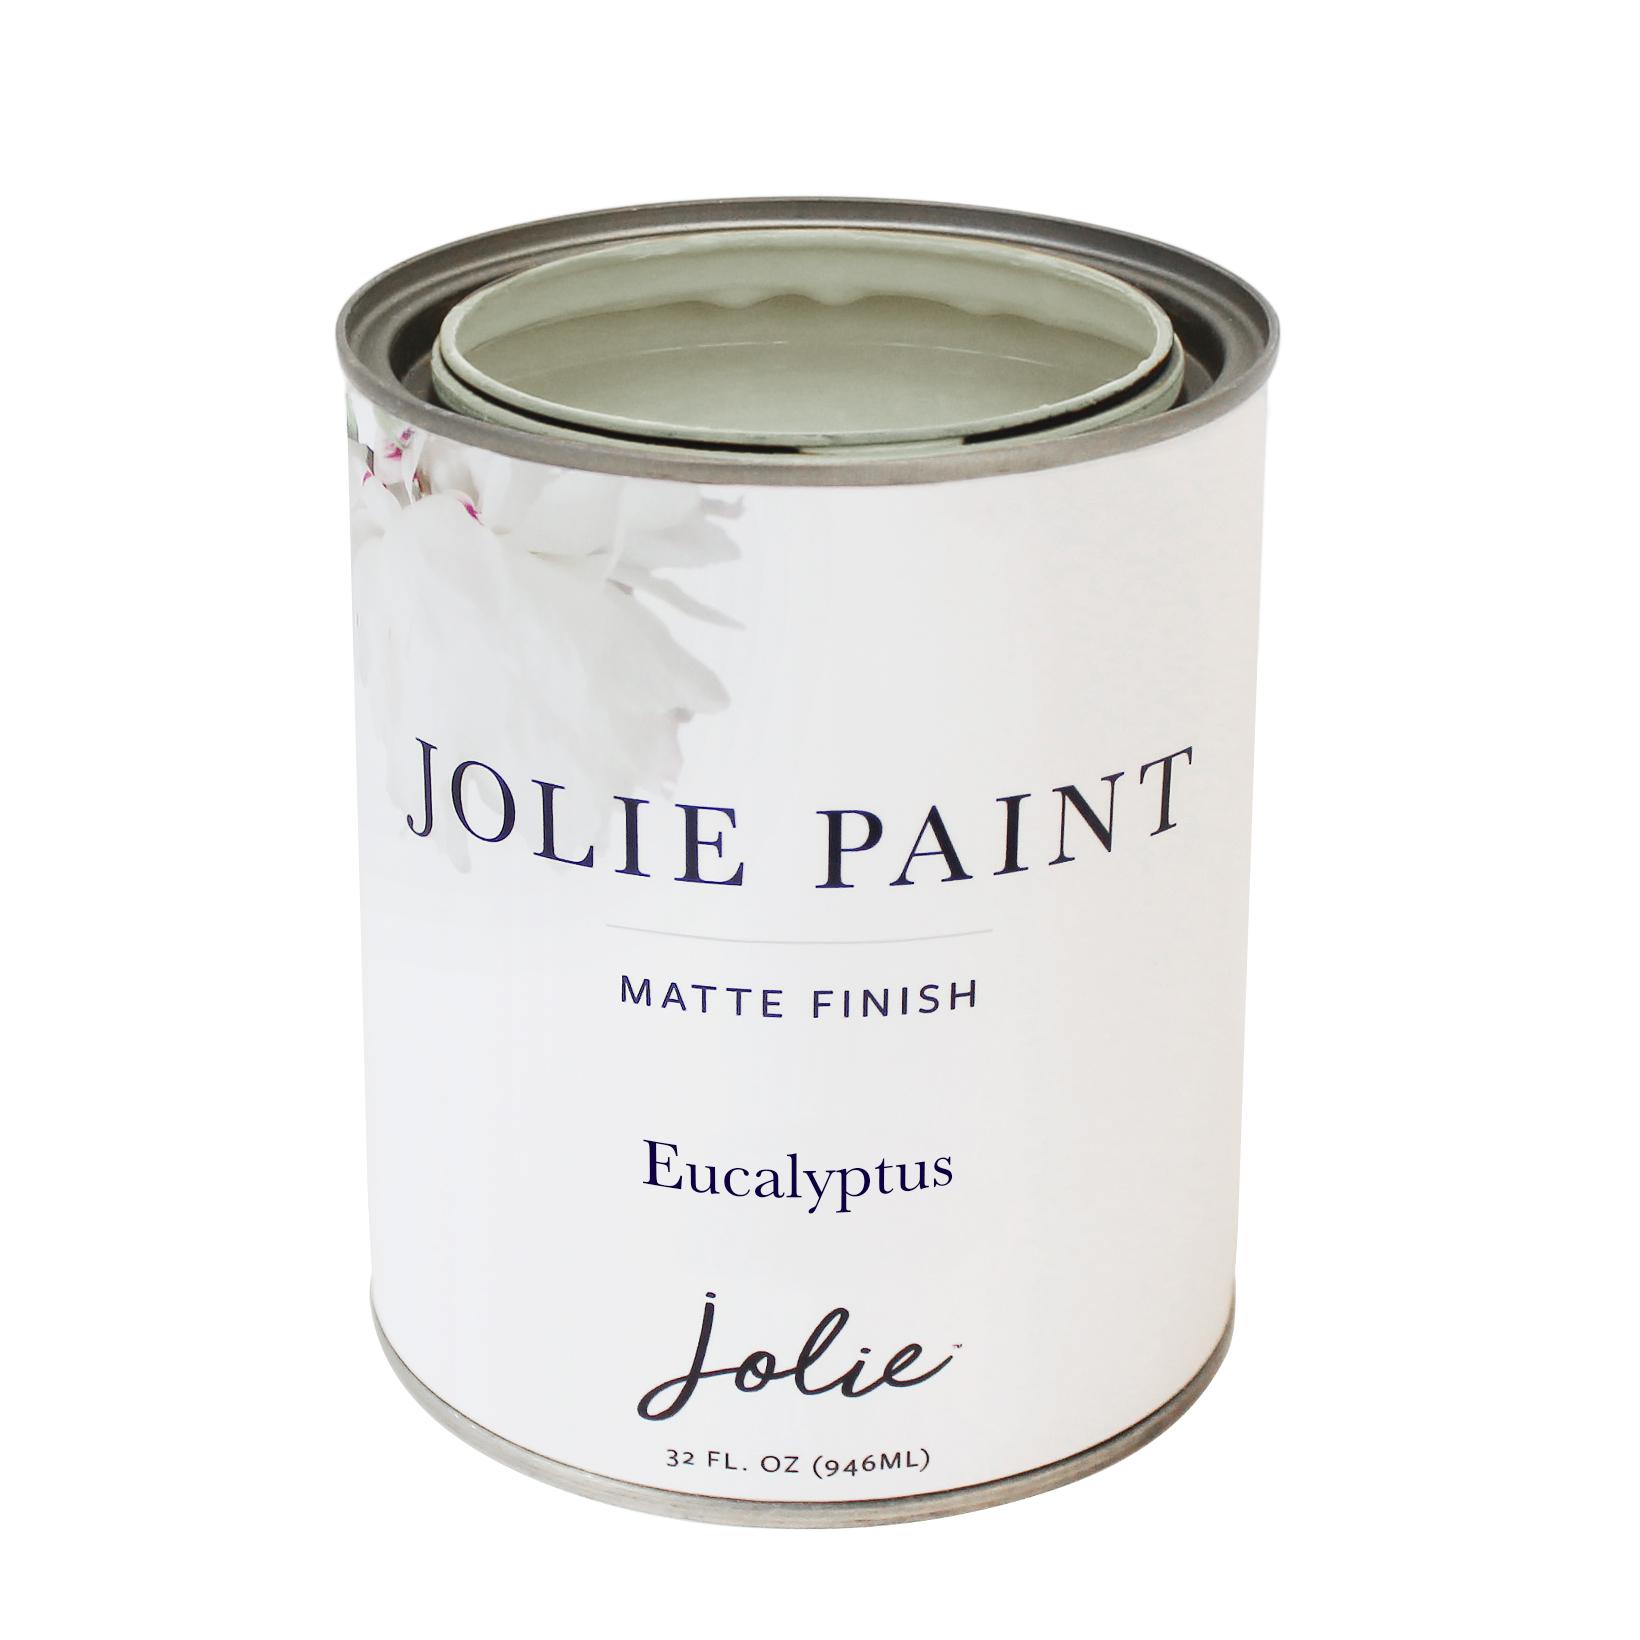 Eucalyptus - Jolie Paint